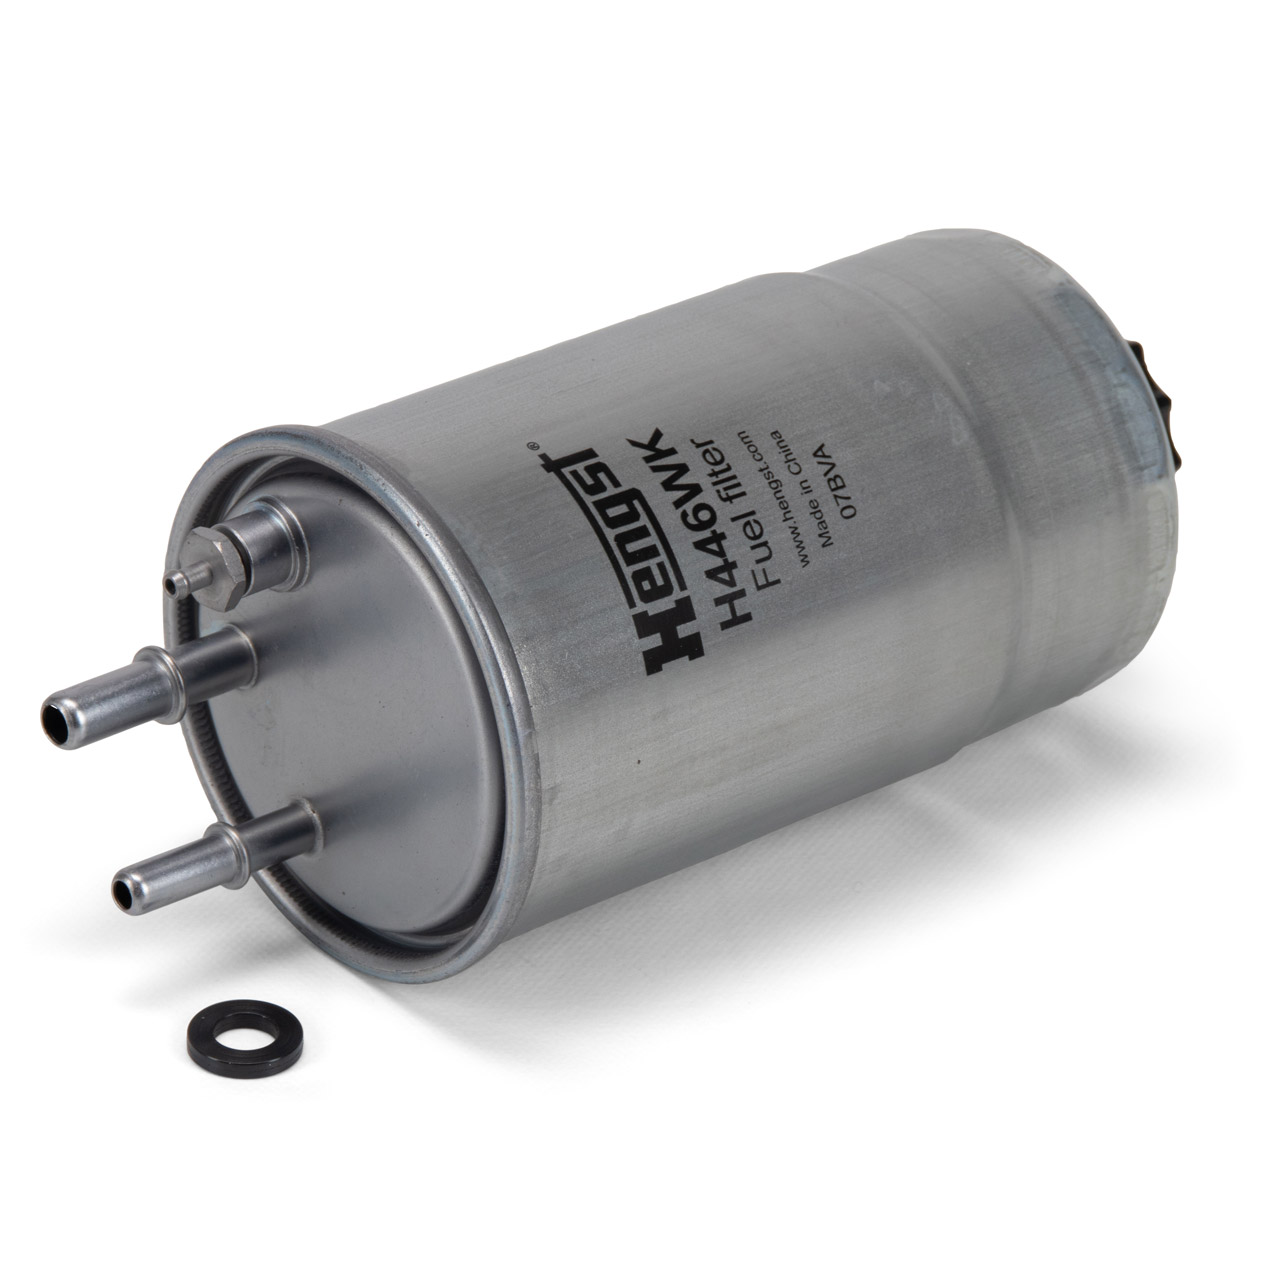 HENGST H446WK Kraftstofffilter für CITROEN JUMPER FIAT DUCATO PEUGEOT BOXER